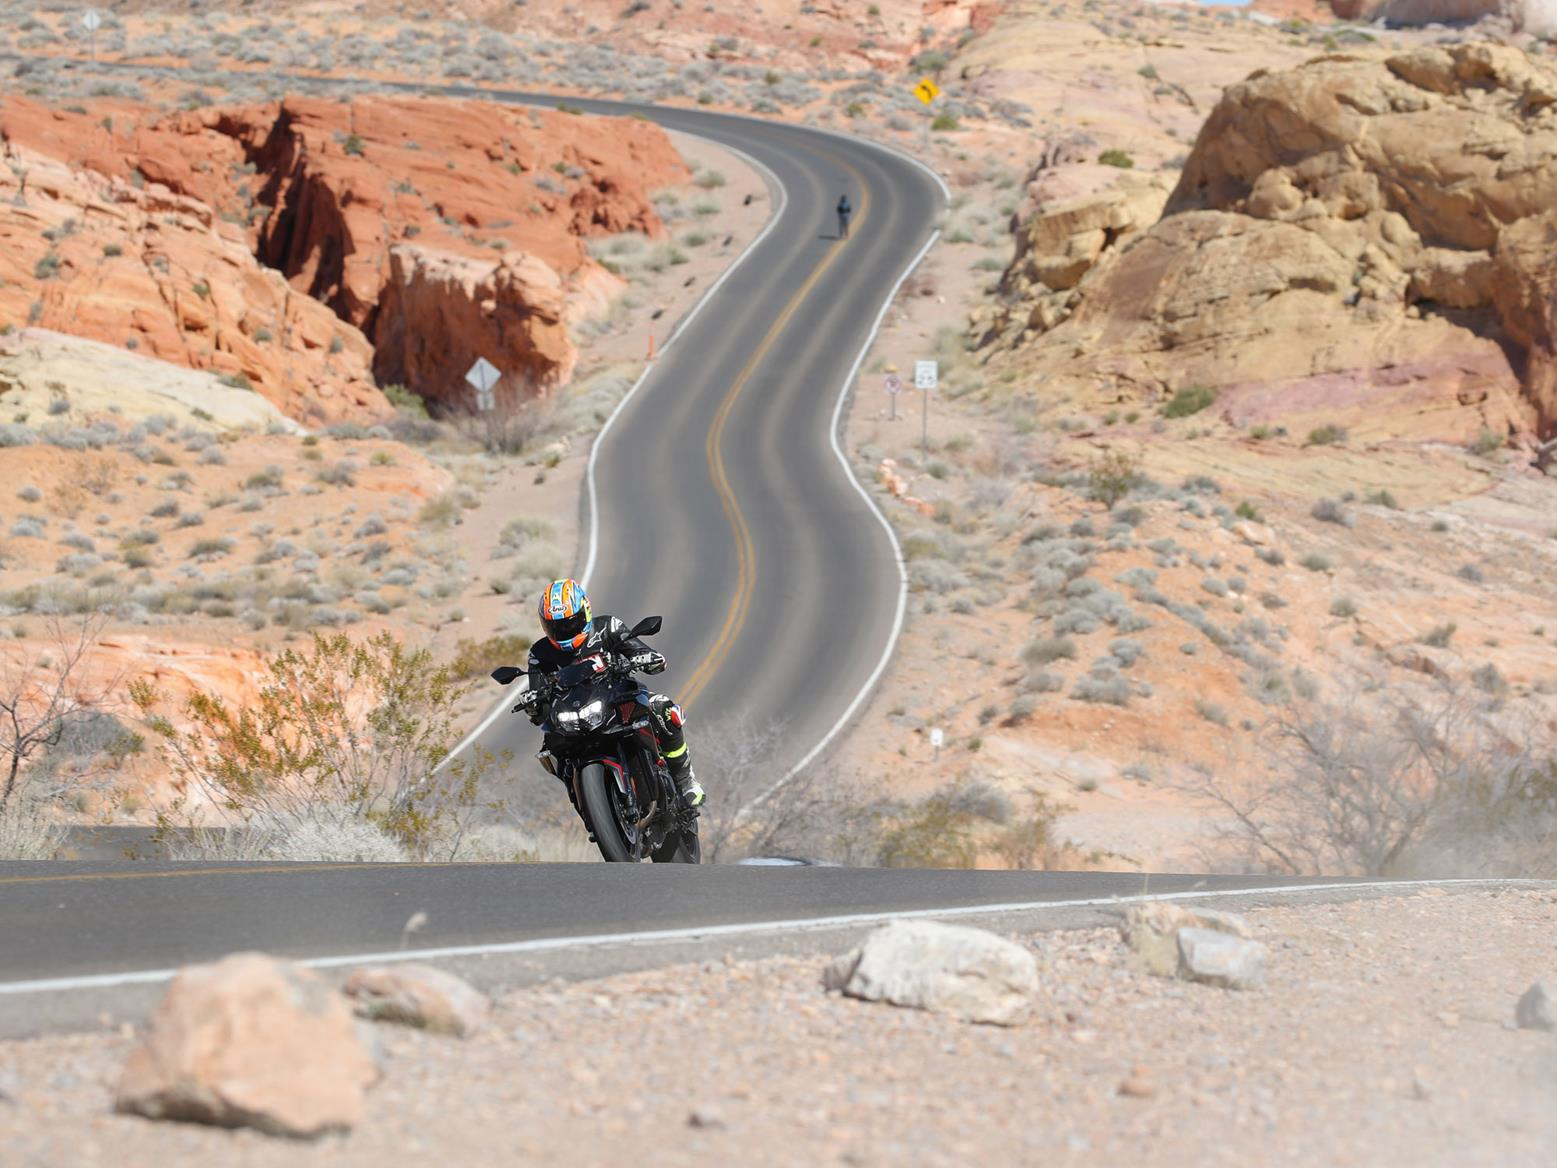 Riding the 2020 Kawasaki Z H2 on the road